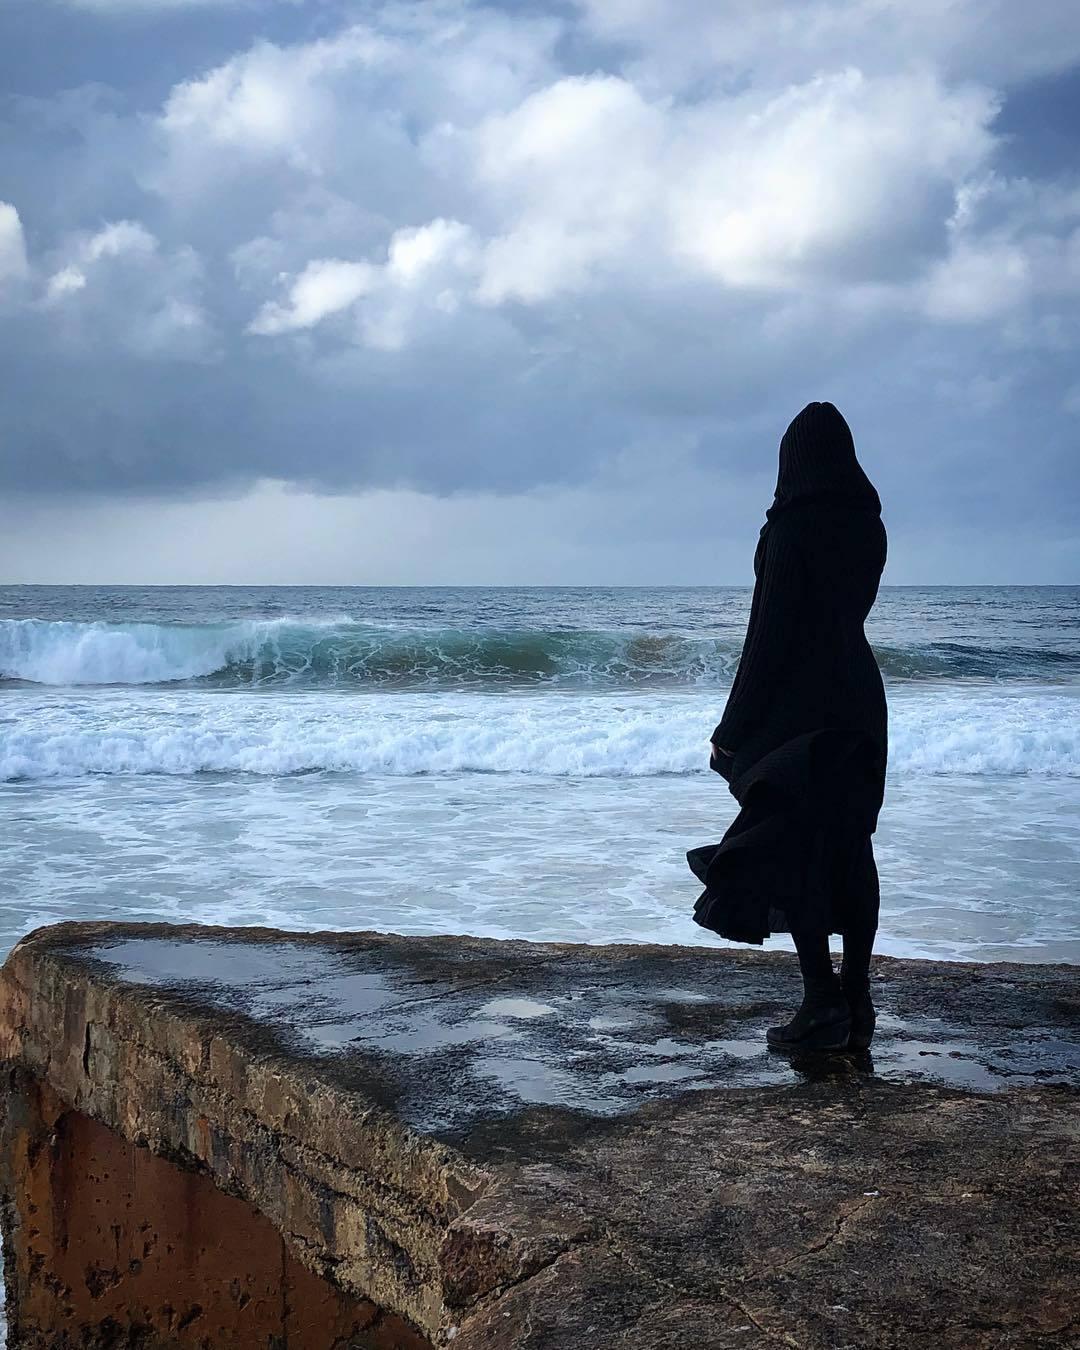 To condemn the wild ocean